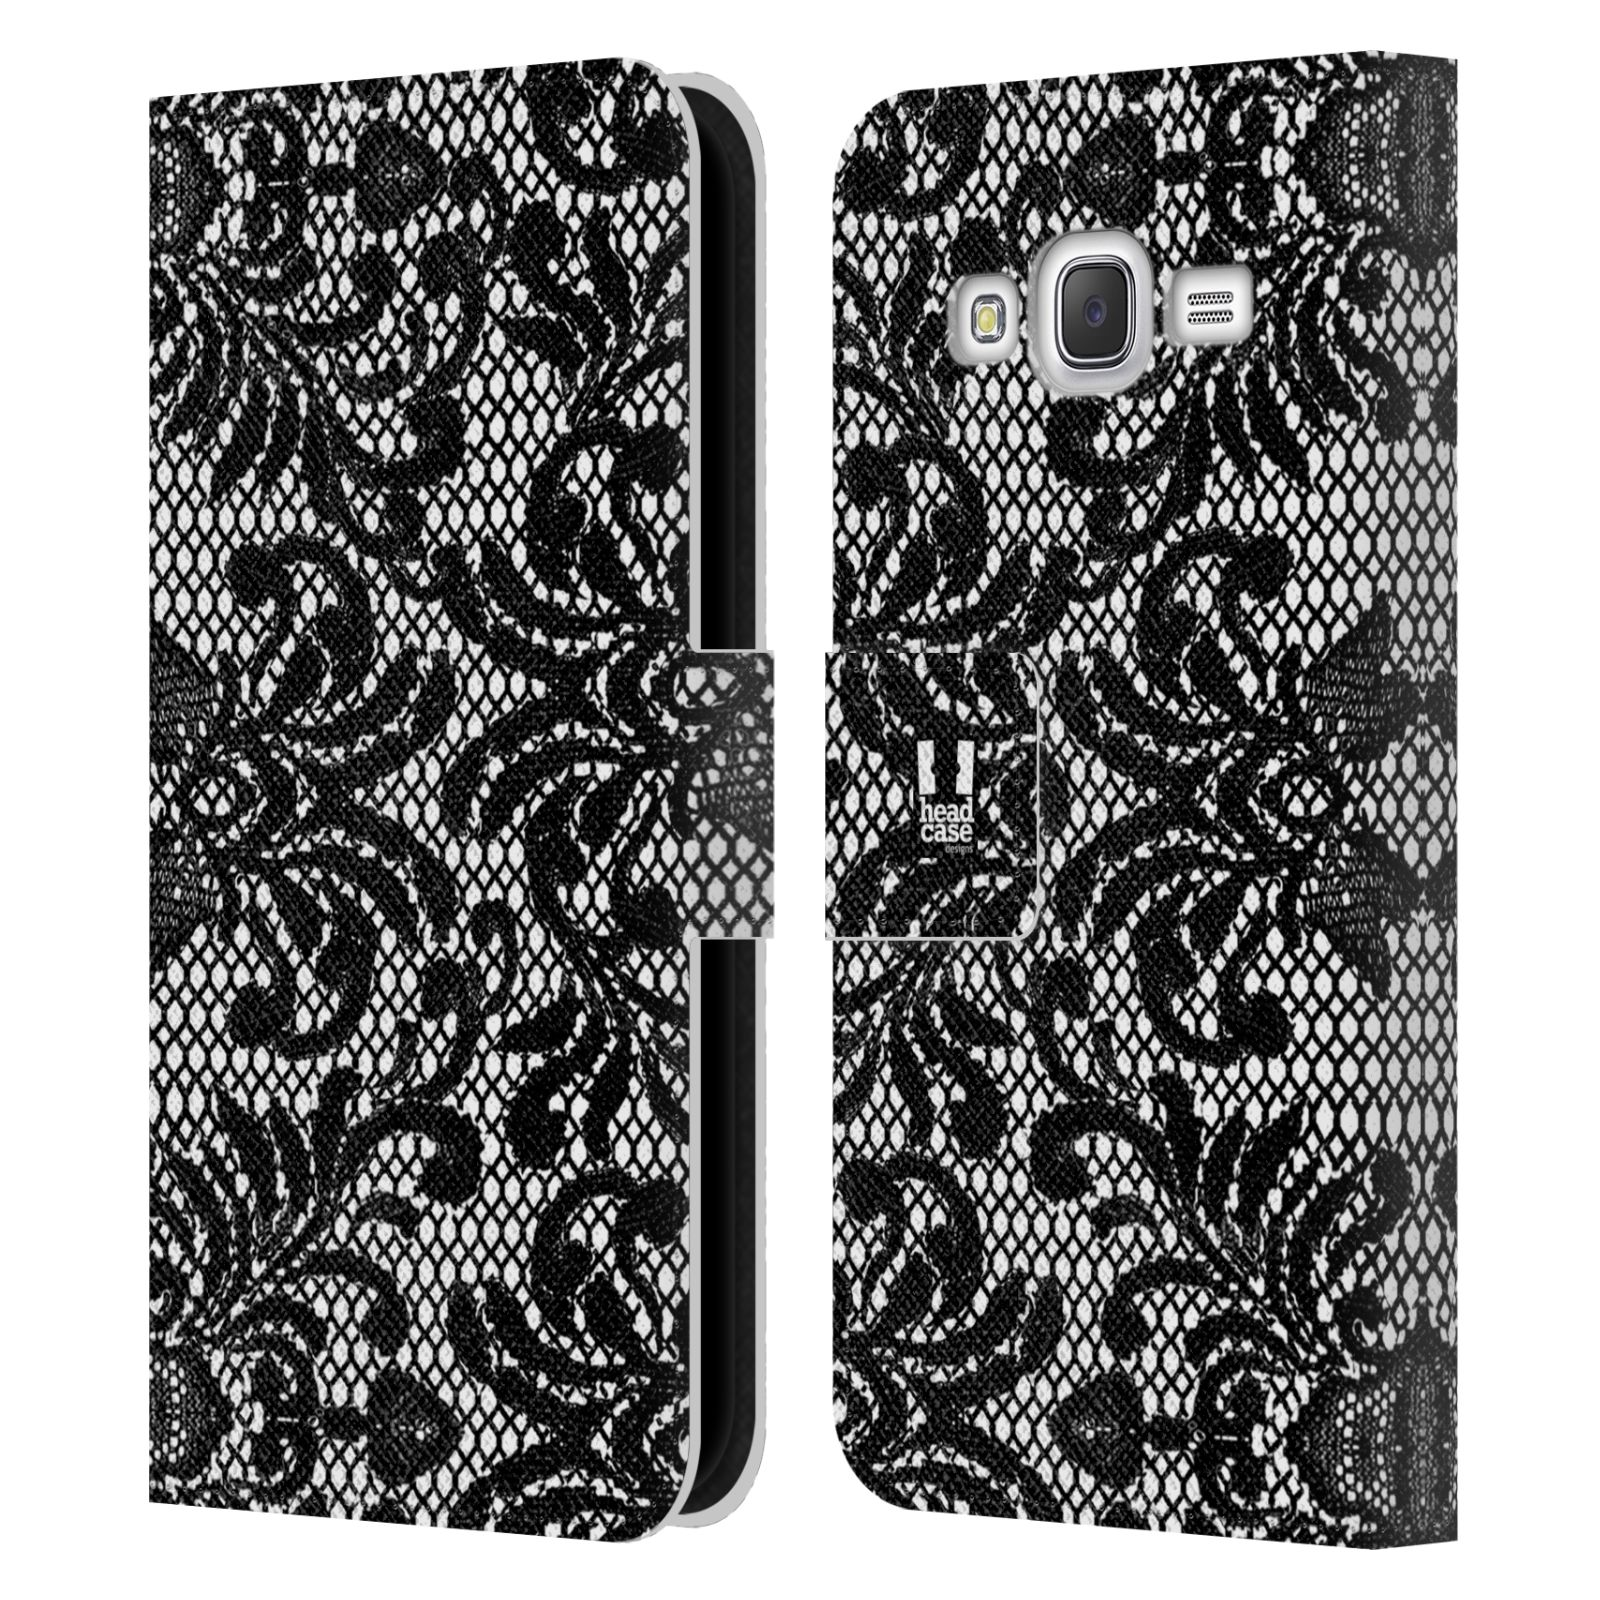 HEAD CASE Flipové pouzdro pro mobil Samsung Galaxy J5 (J500) / J5 DUOS ČERNOBÍLÁ KRAJKA fontána baroko